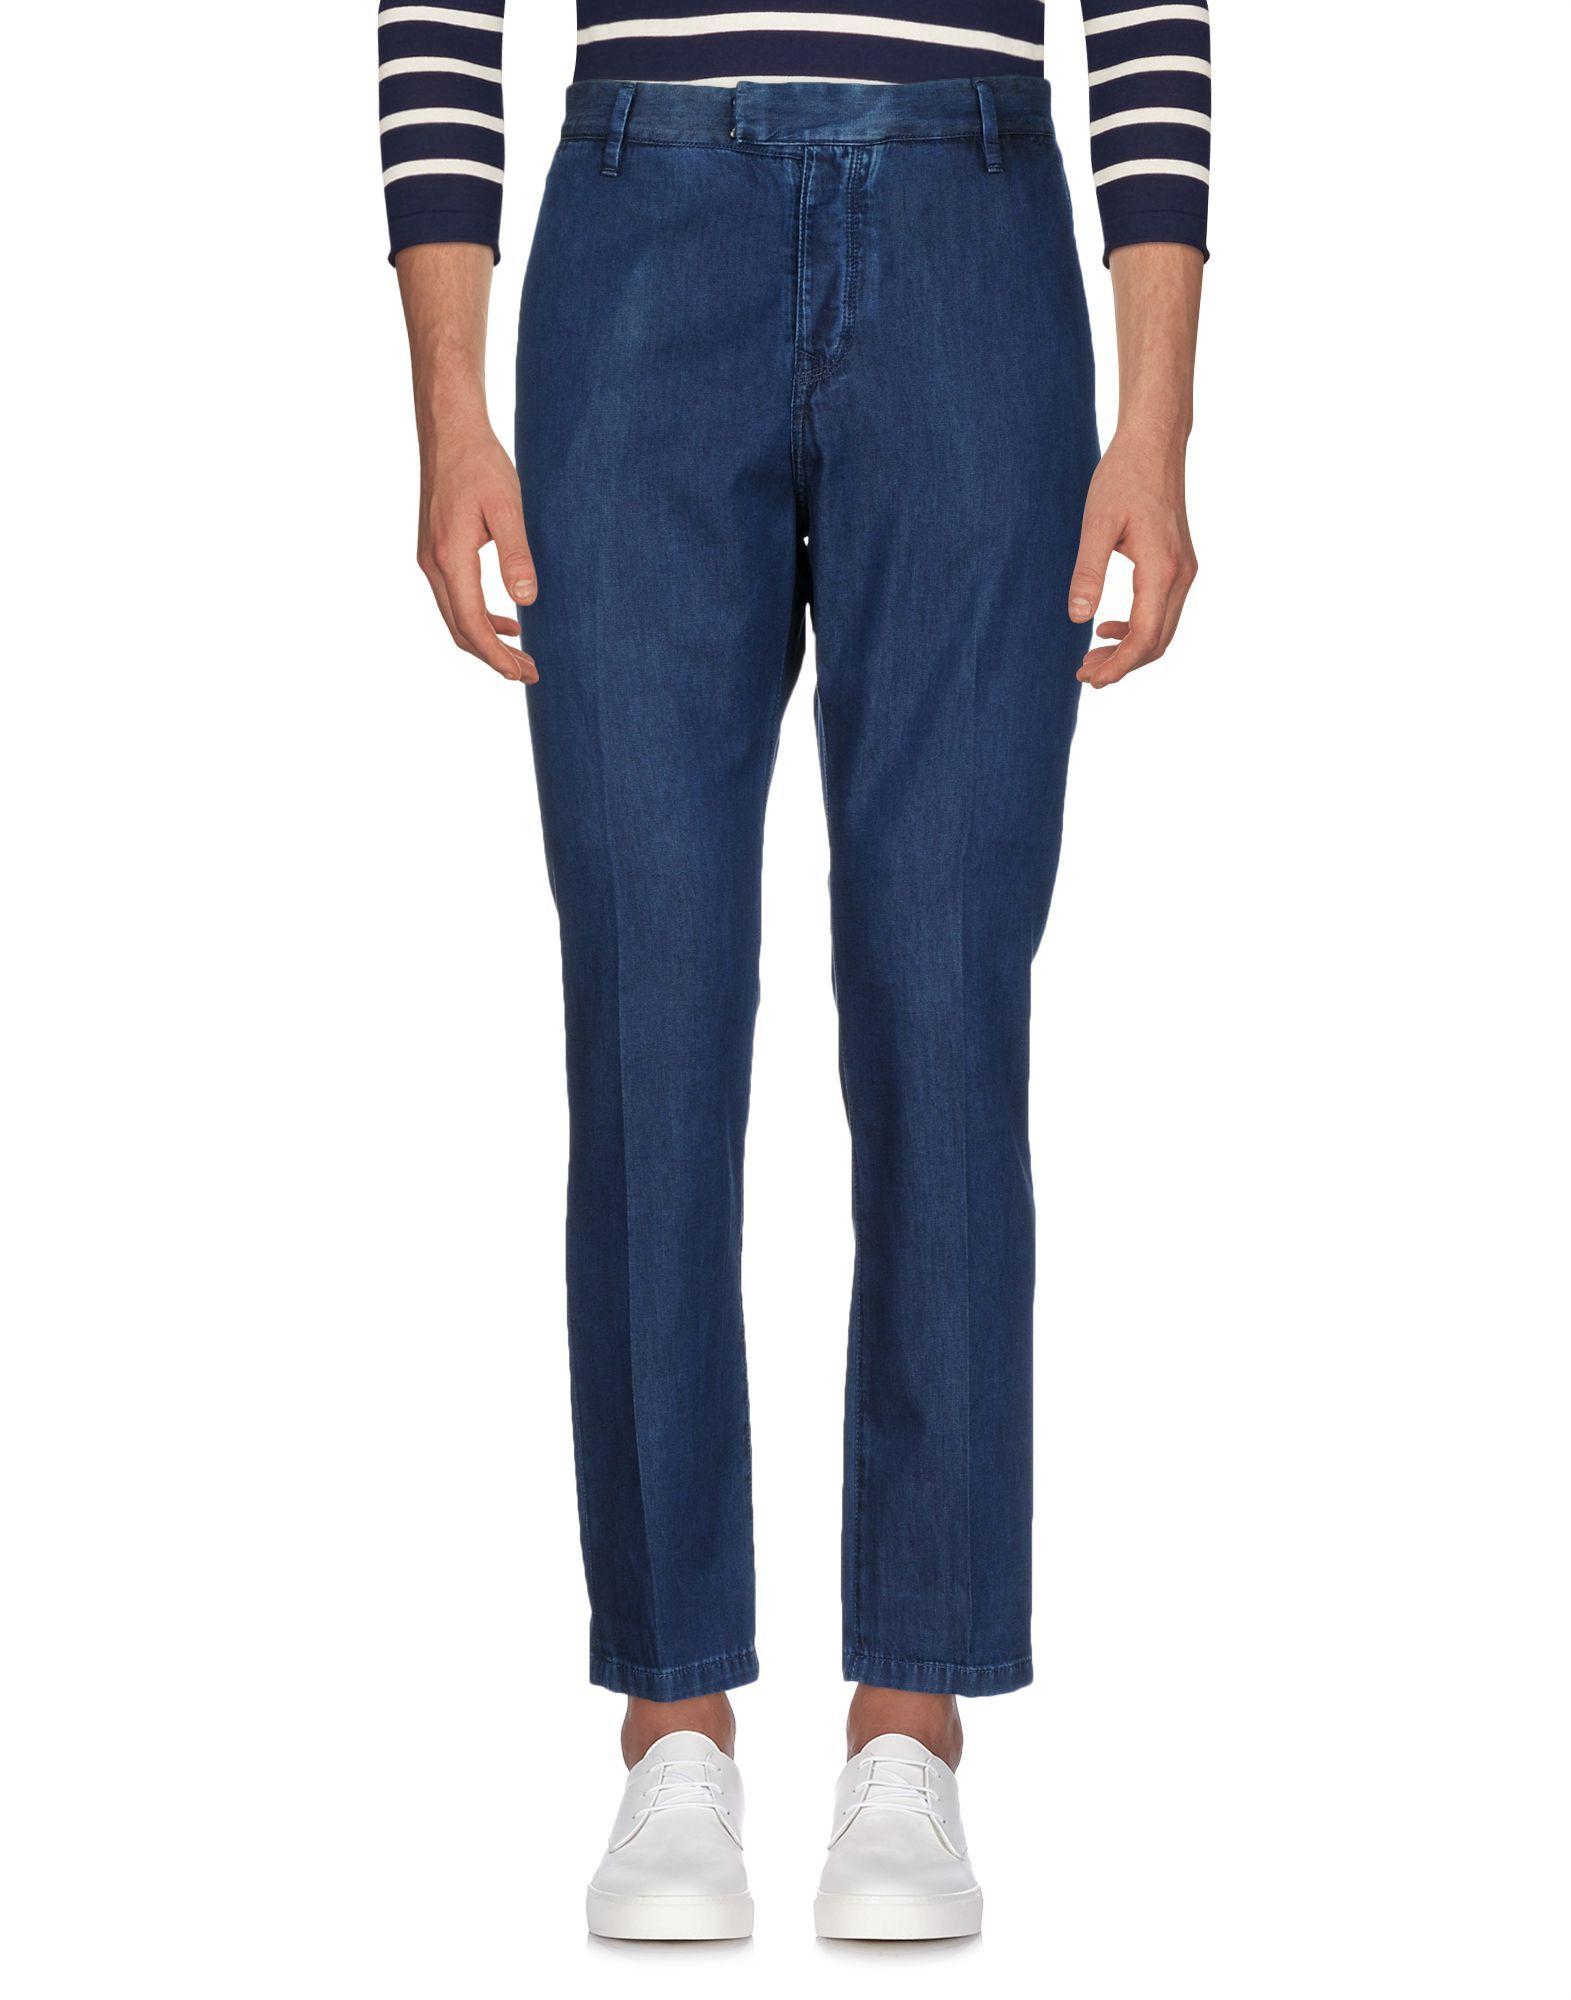 Haikure Blue Straight Leg Jeans